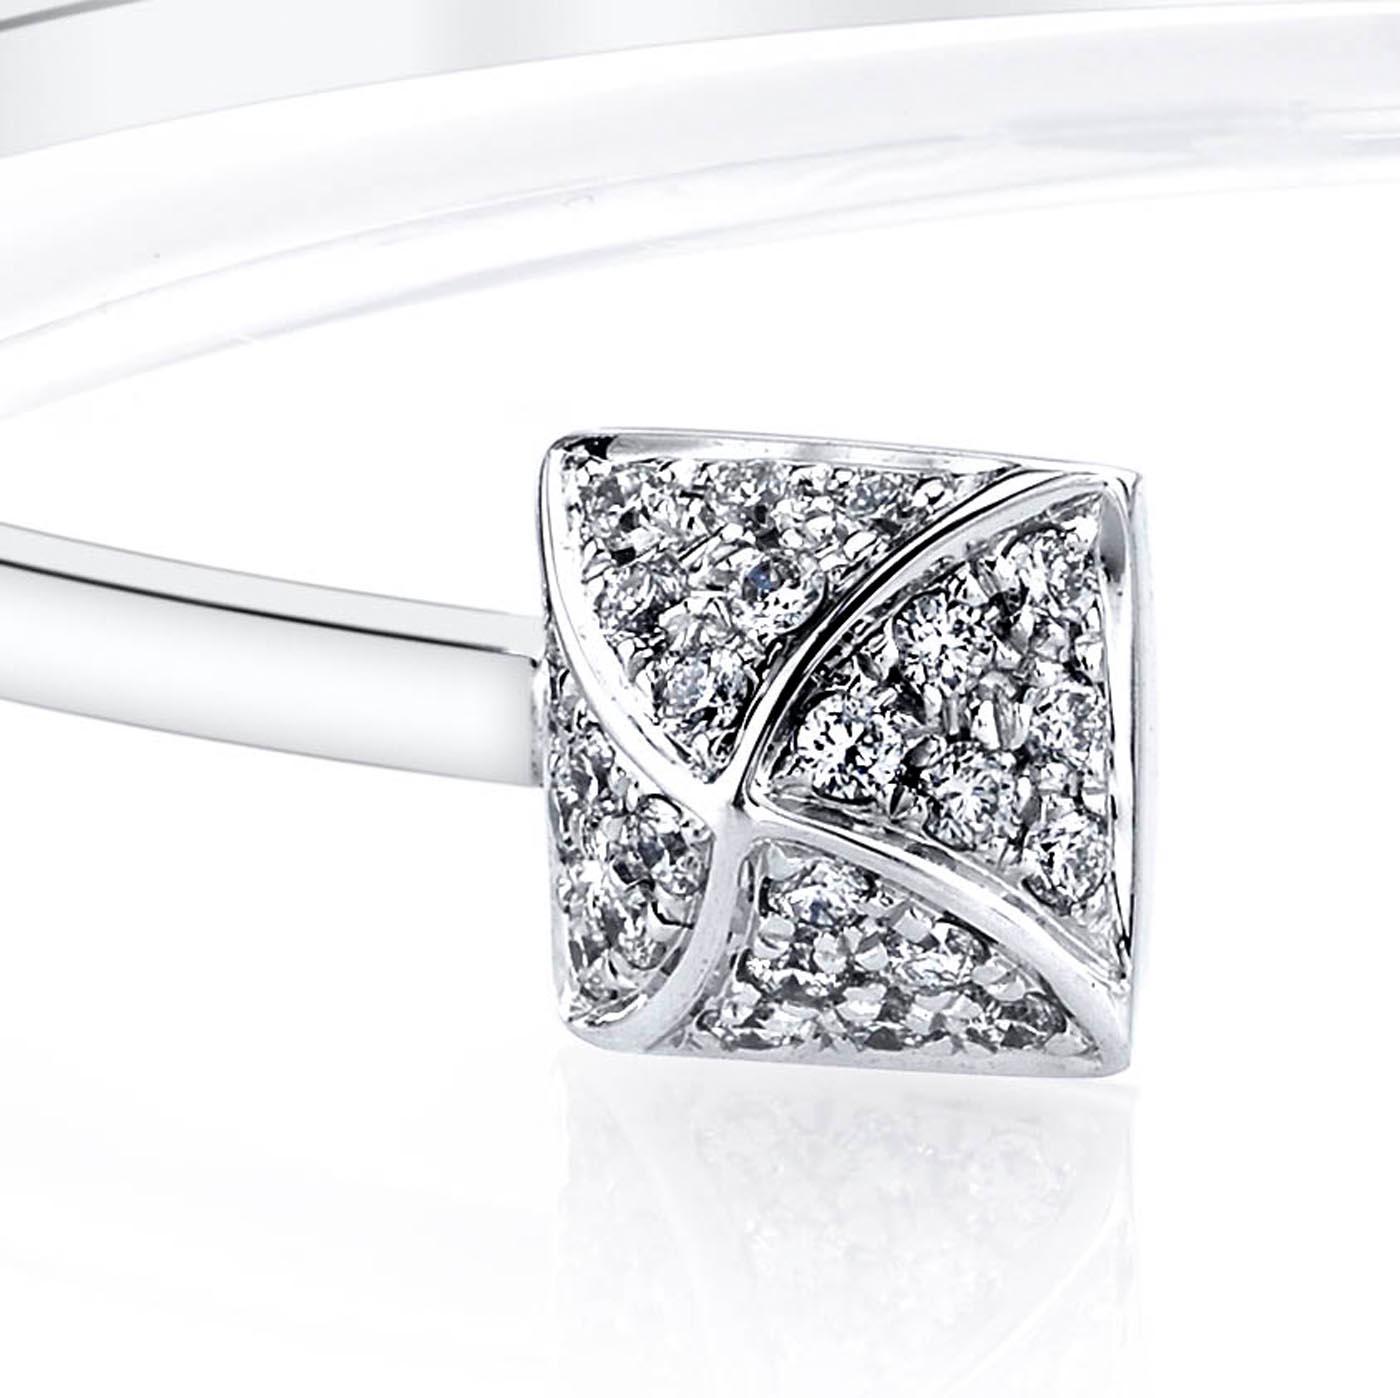 Diamond Bracelet - Bangles & Cuffs Style #: MARS-26681